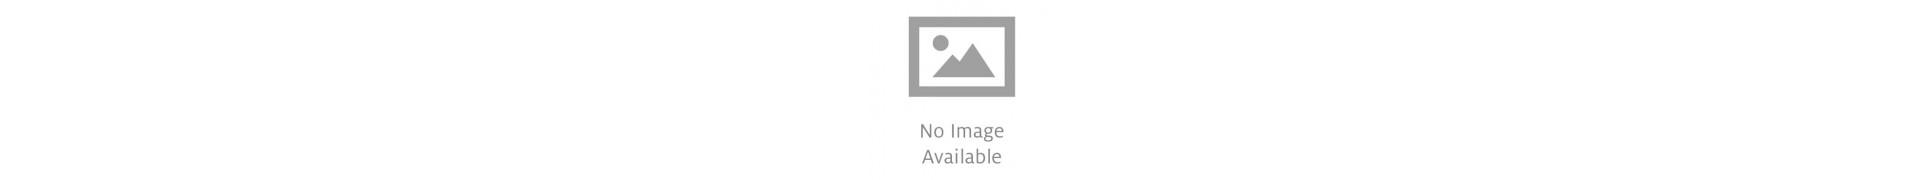 PORTE CARTON RS 40 LAQUE BLANC% sur commande